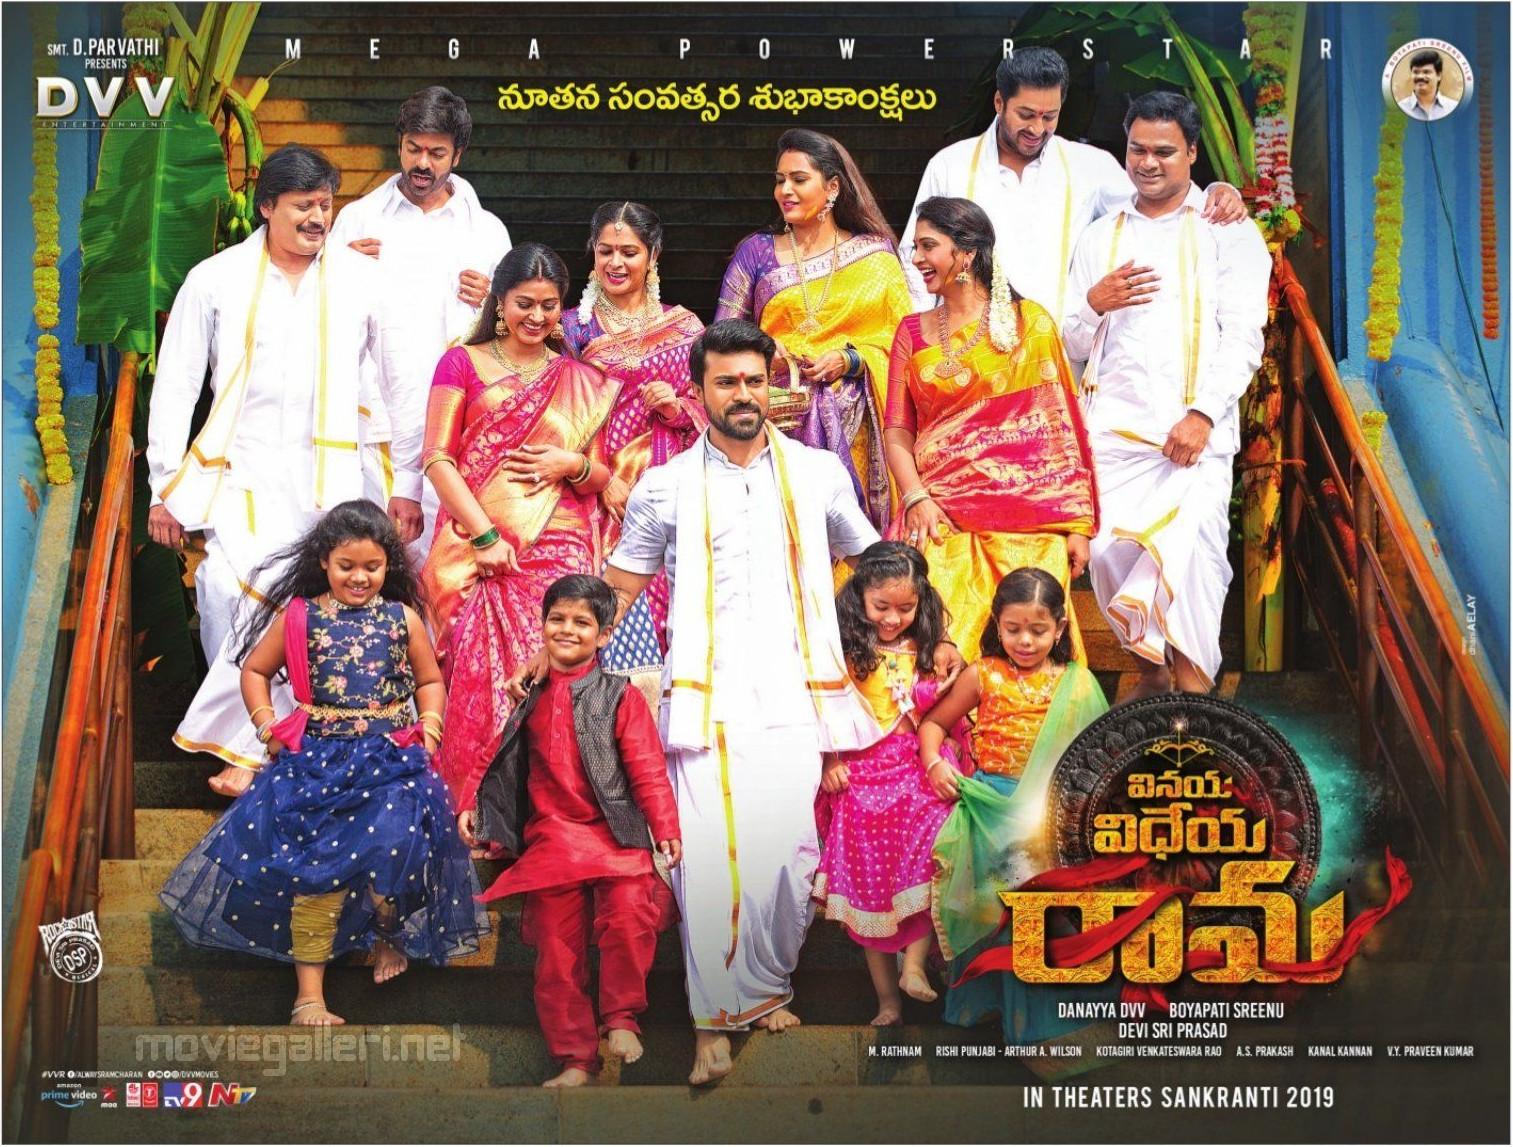 Ram Charan Vinaya Vidheya Rama Movie New Year 2019 Wishes Wallpapers HD